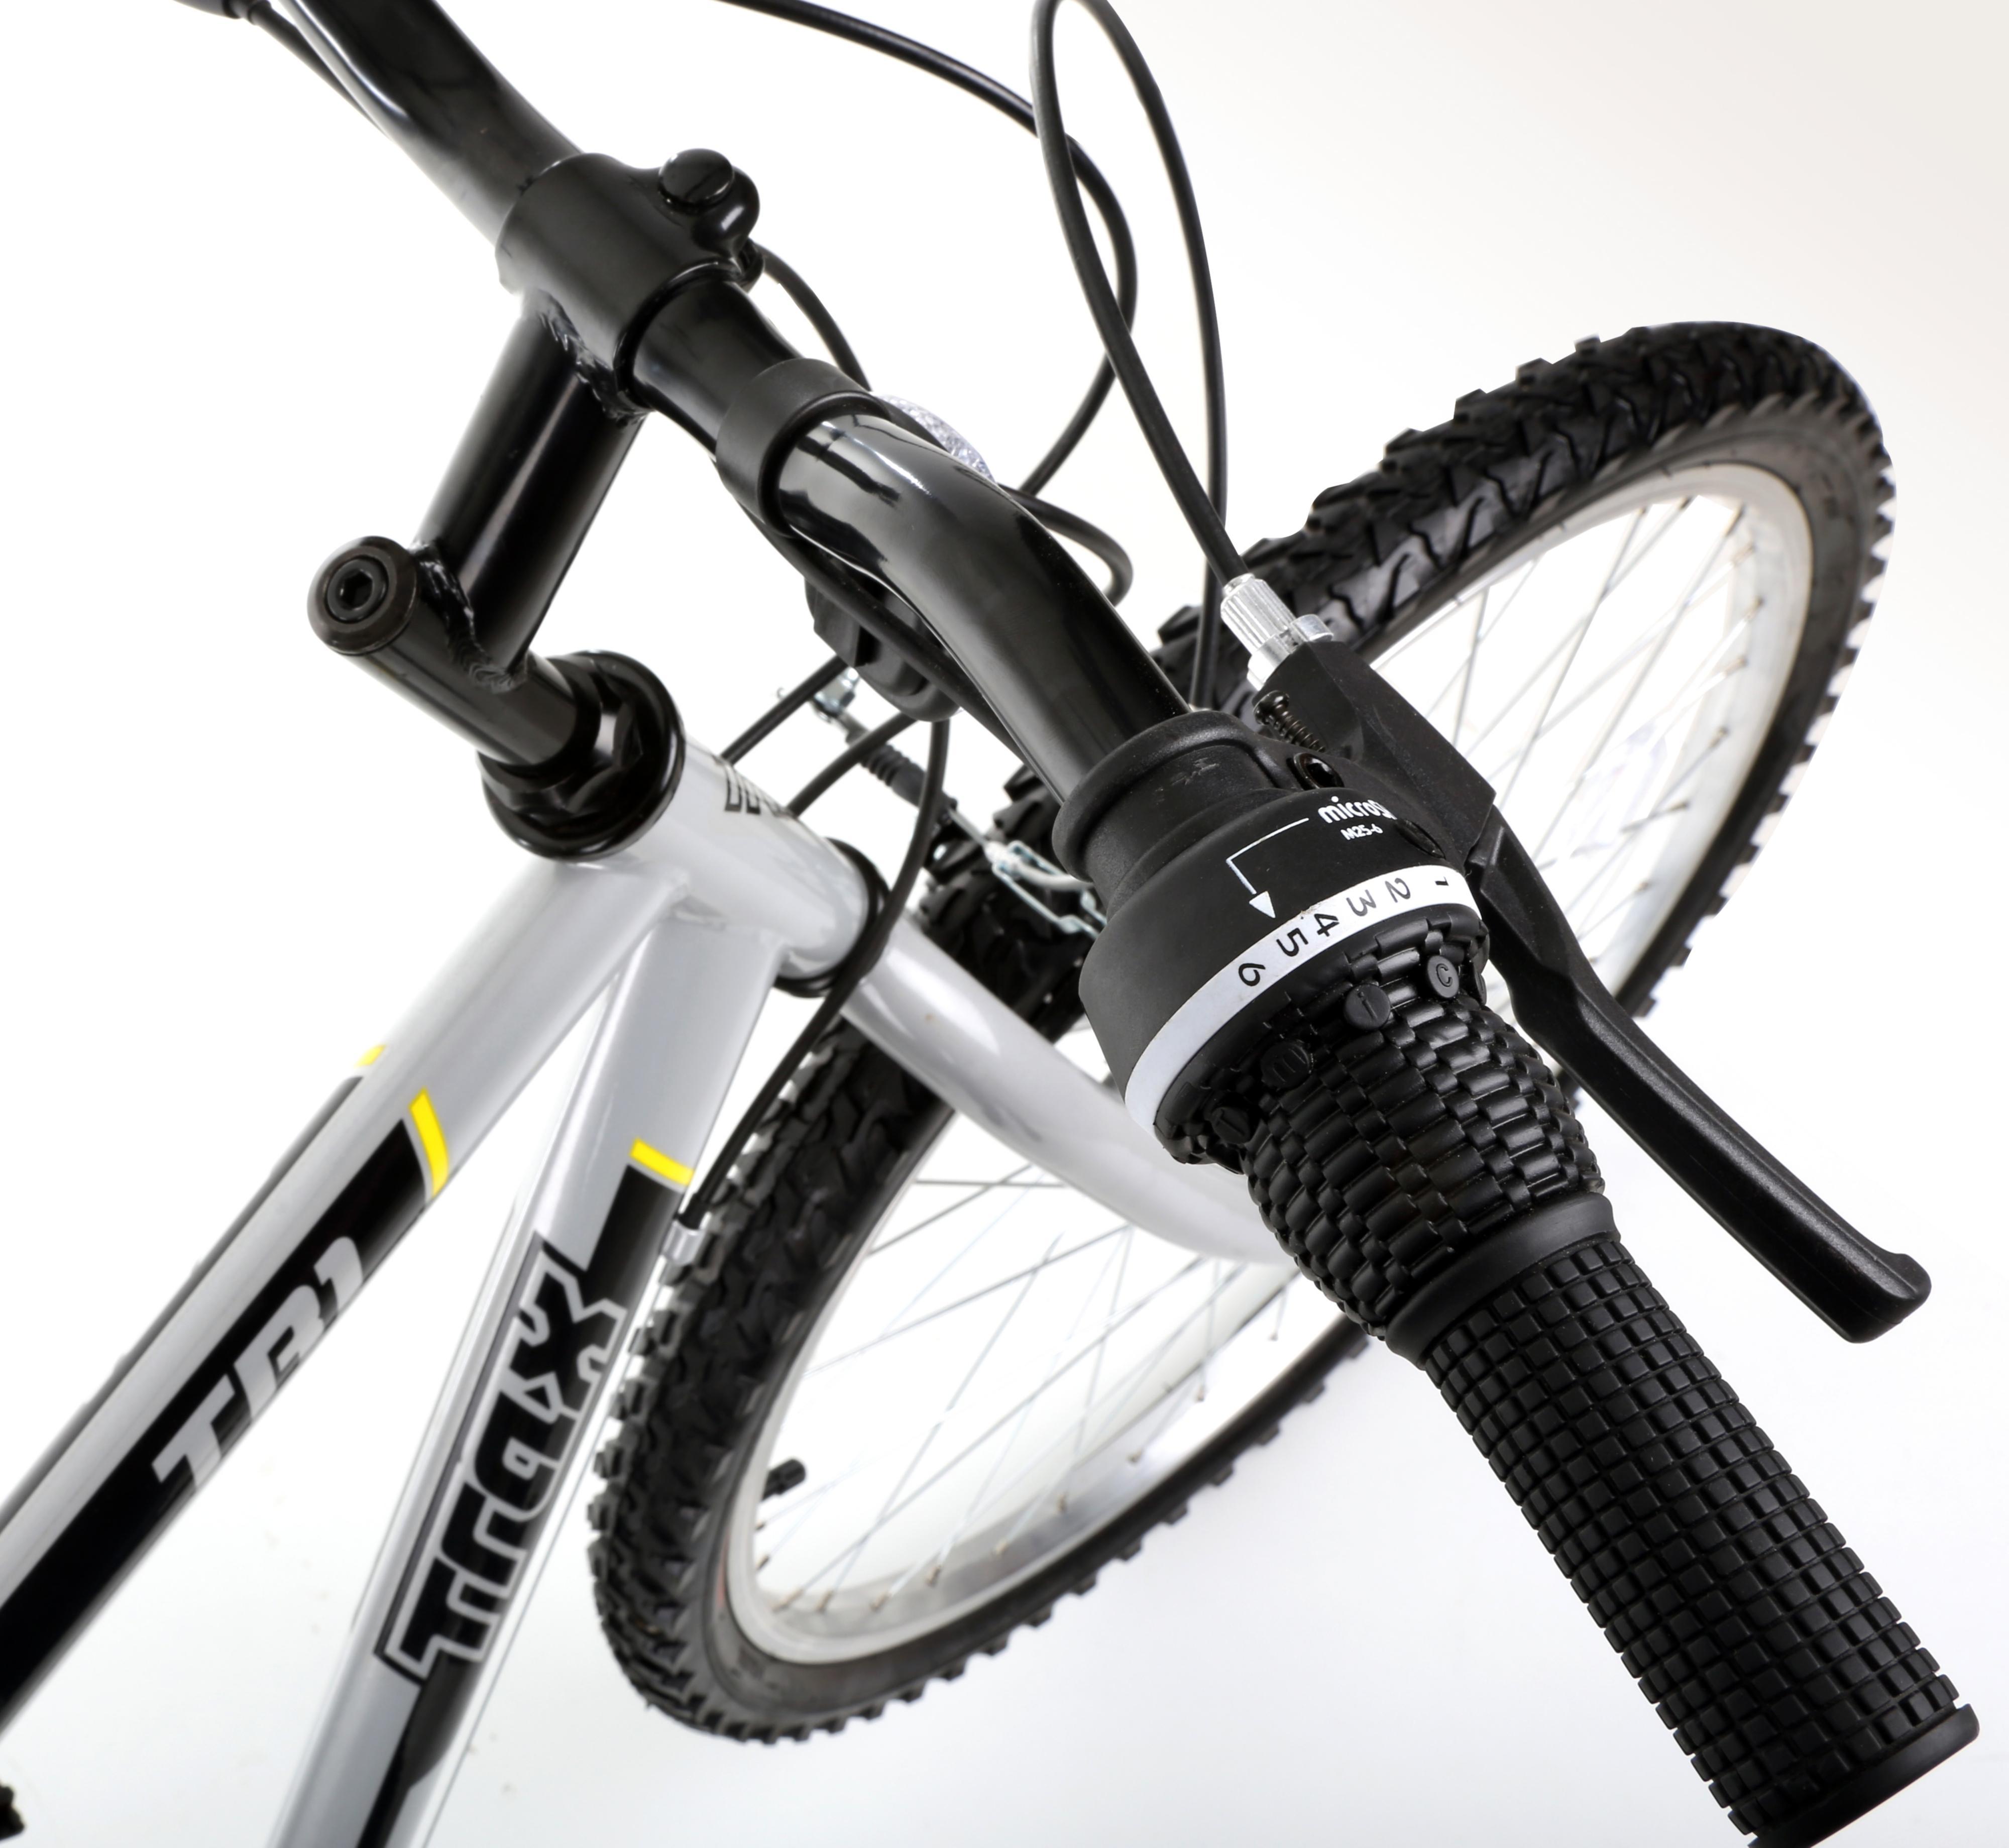 Trax Tr 1 Rigid Mountain Bike Bicycle 26 Inch Wheels Steel Frame